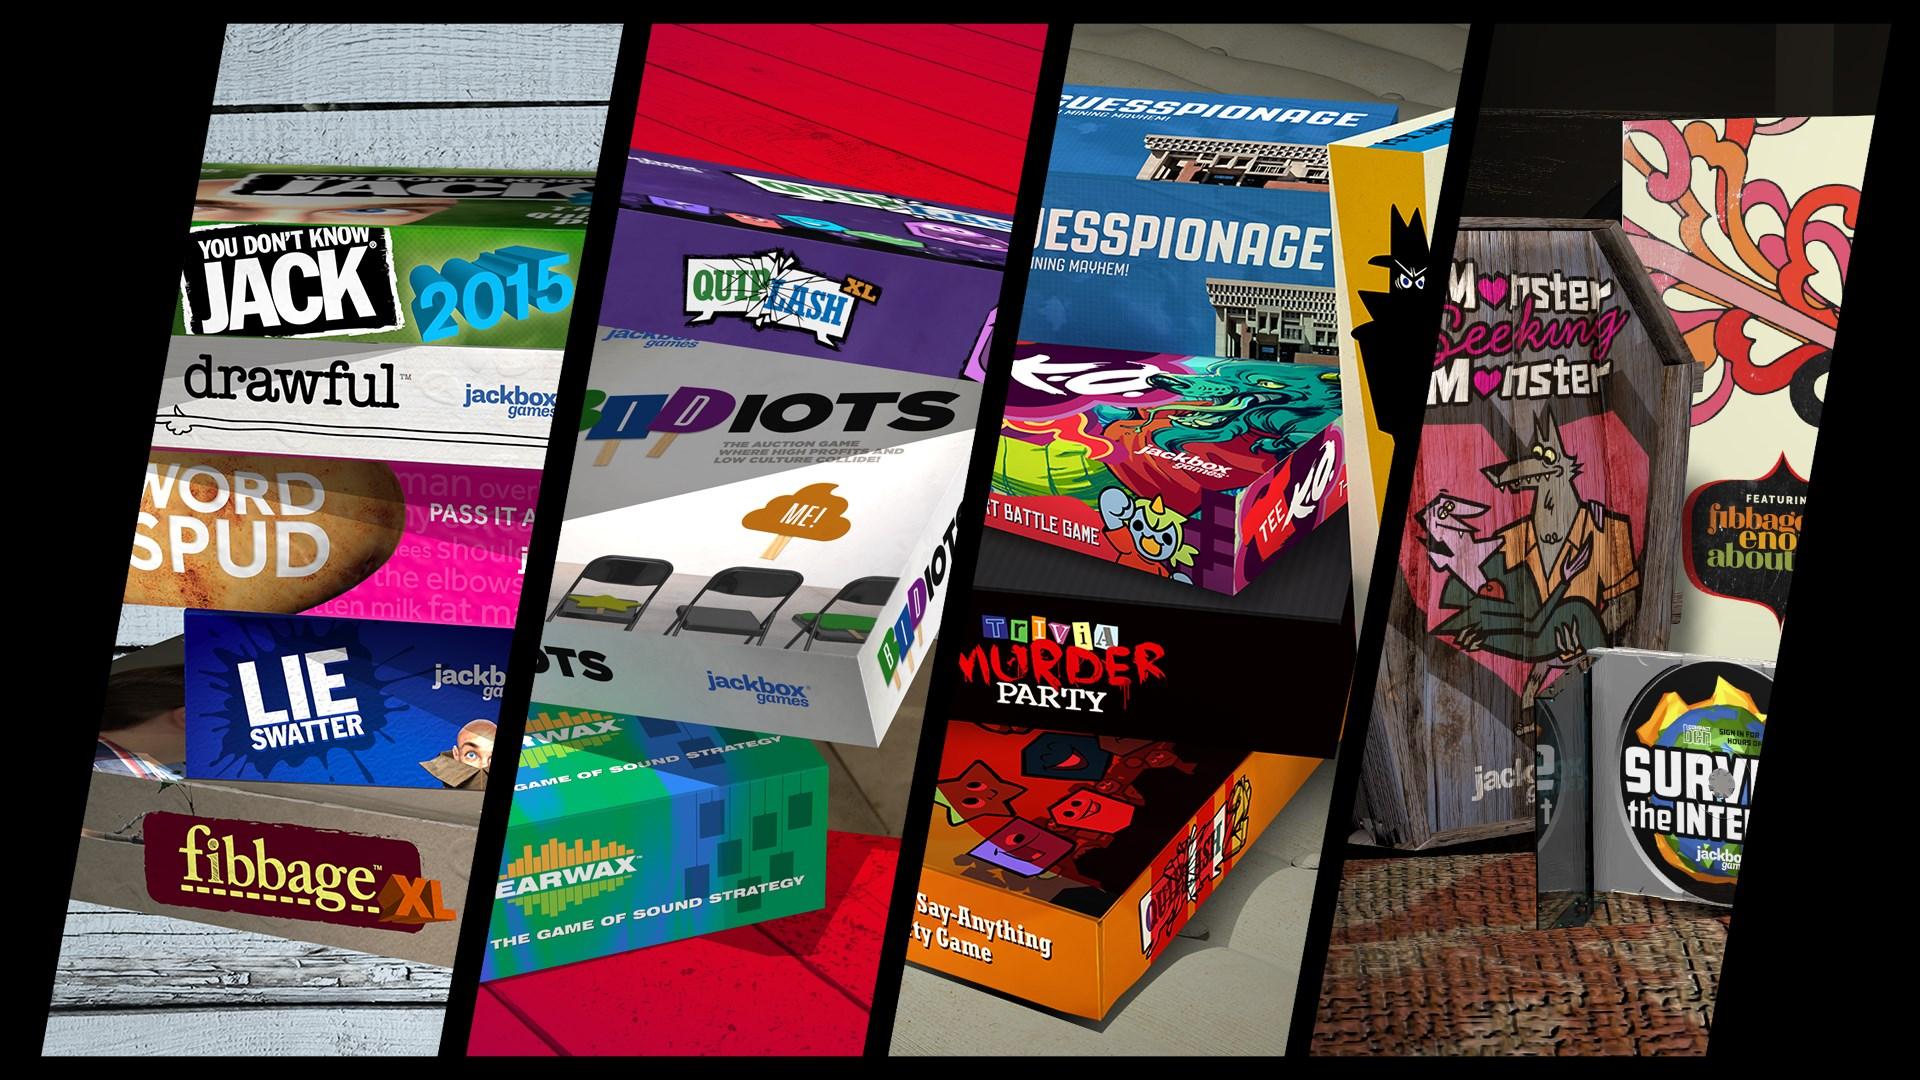 jackbox party pack 3 free download mac